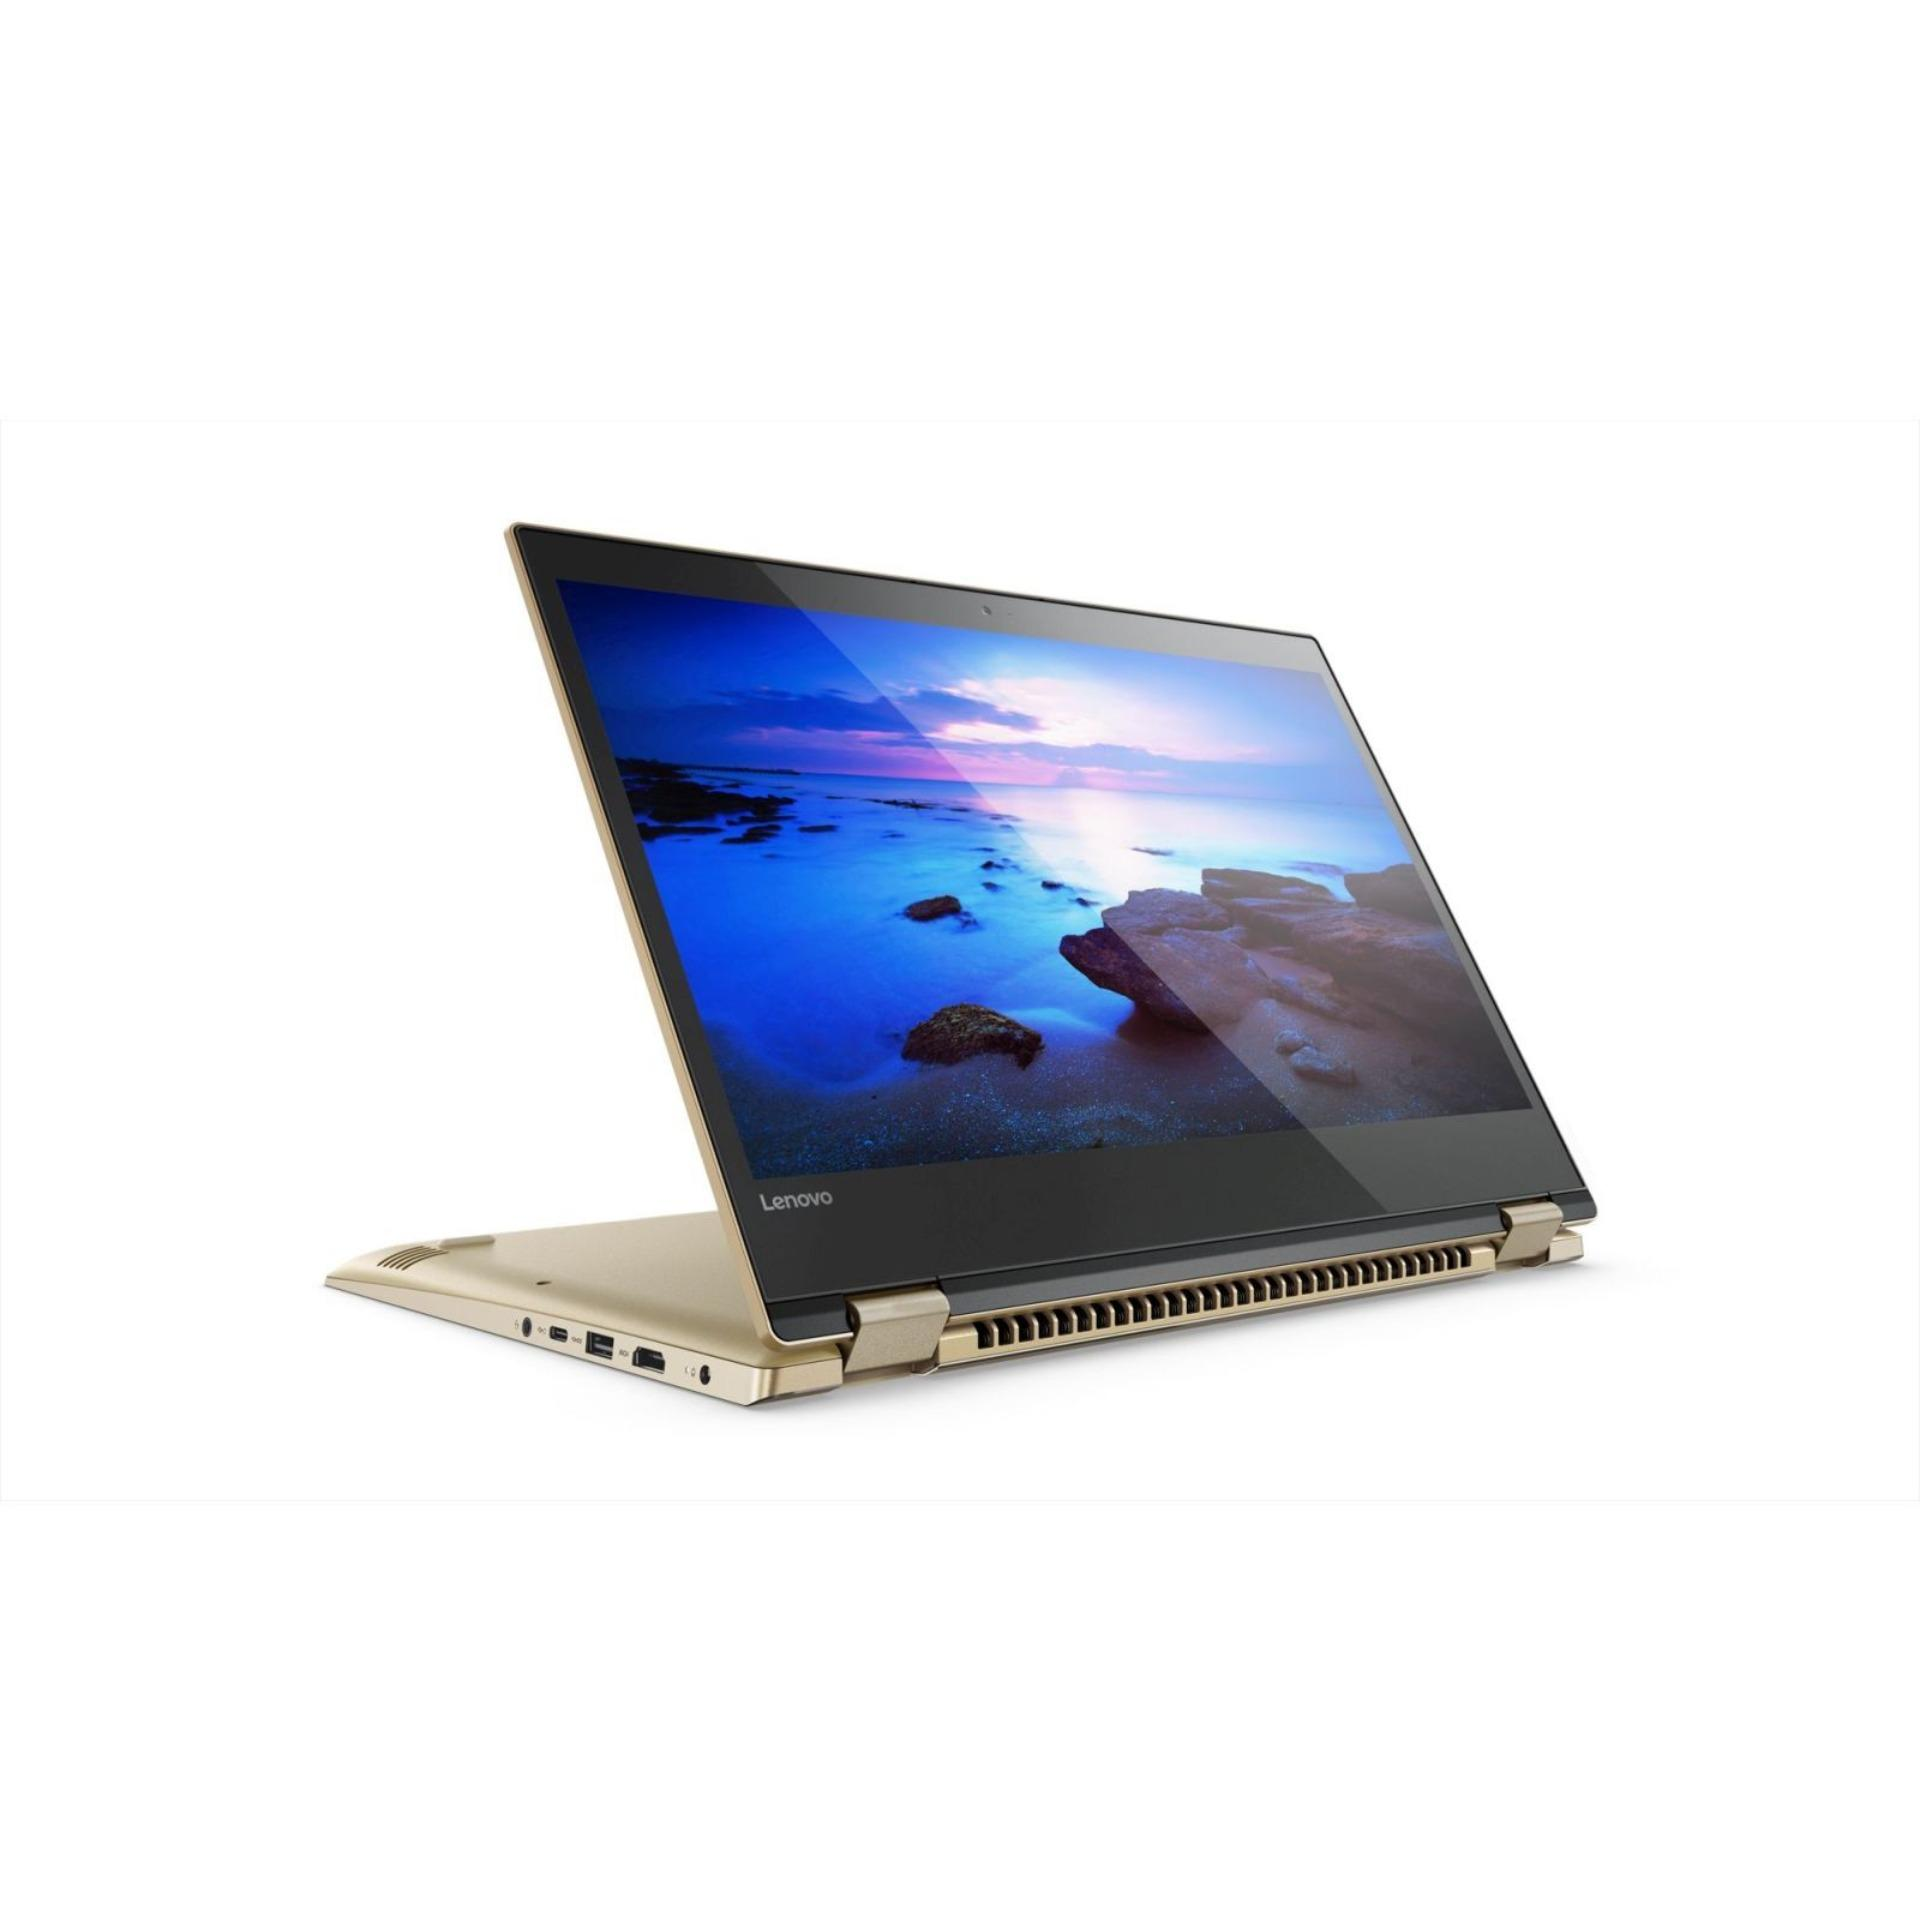 LENOVO IdeaPad YOGA 520-14IKBR: 14.0 FHD IPS AG TOUCH(SLIM) INTEL® CORE™ i5-8250U PROCESSOR Graphic: NVIDIA® GEFORCE® GT 940MX (2GB GDDR5) 1TB 7MM 5400RPM / 128G M.2 PCIE / 8G(1X8GBDDR4 WINDOW 10 HOME / GOLD METALLIC